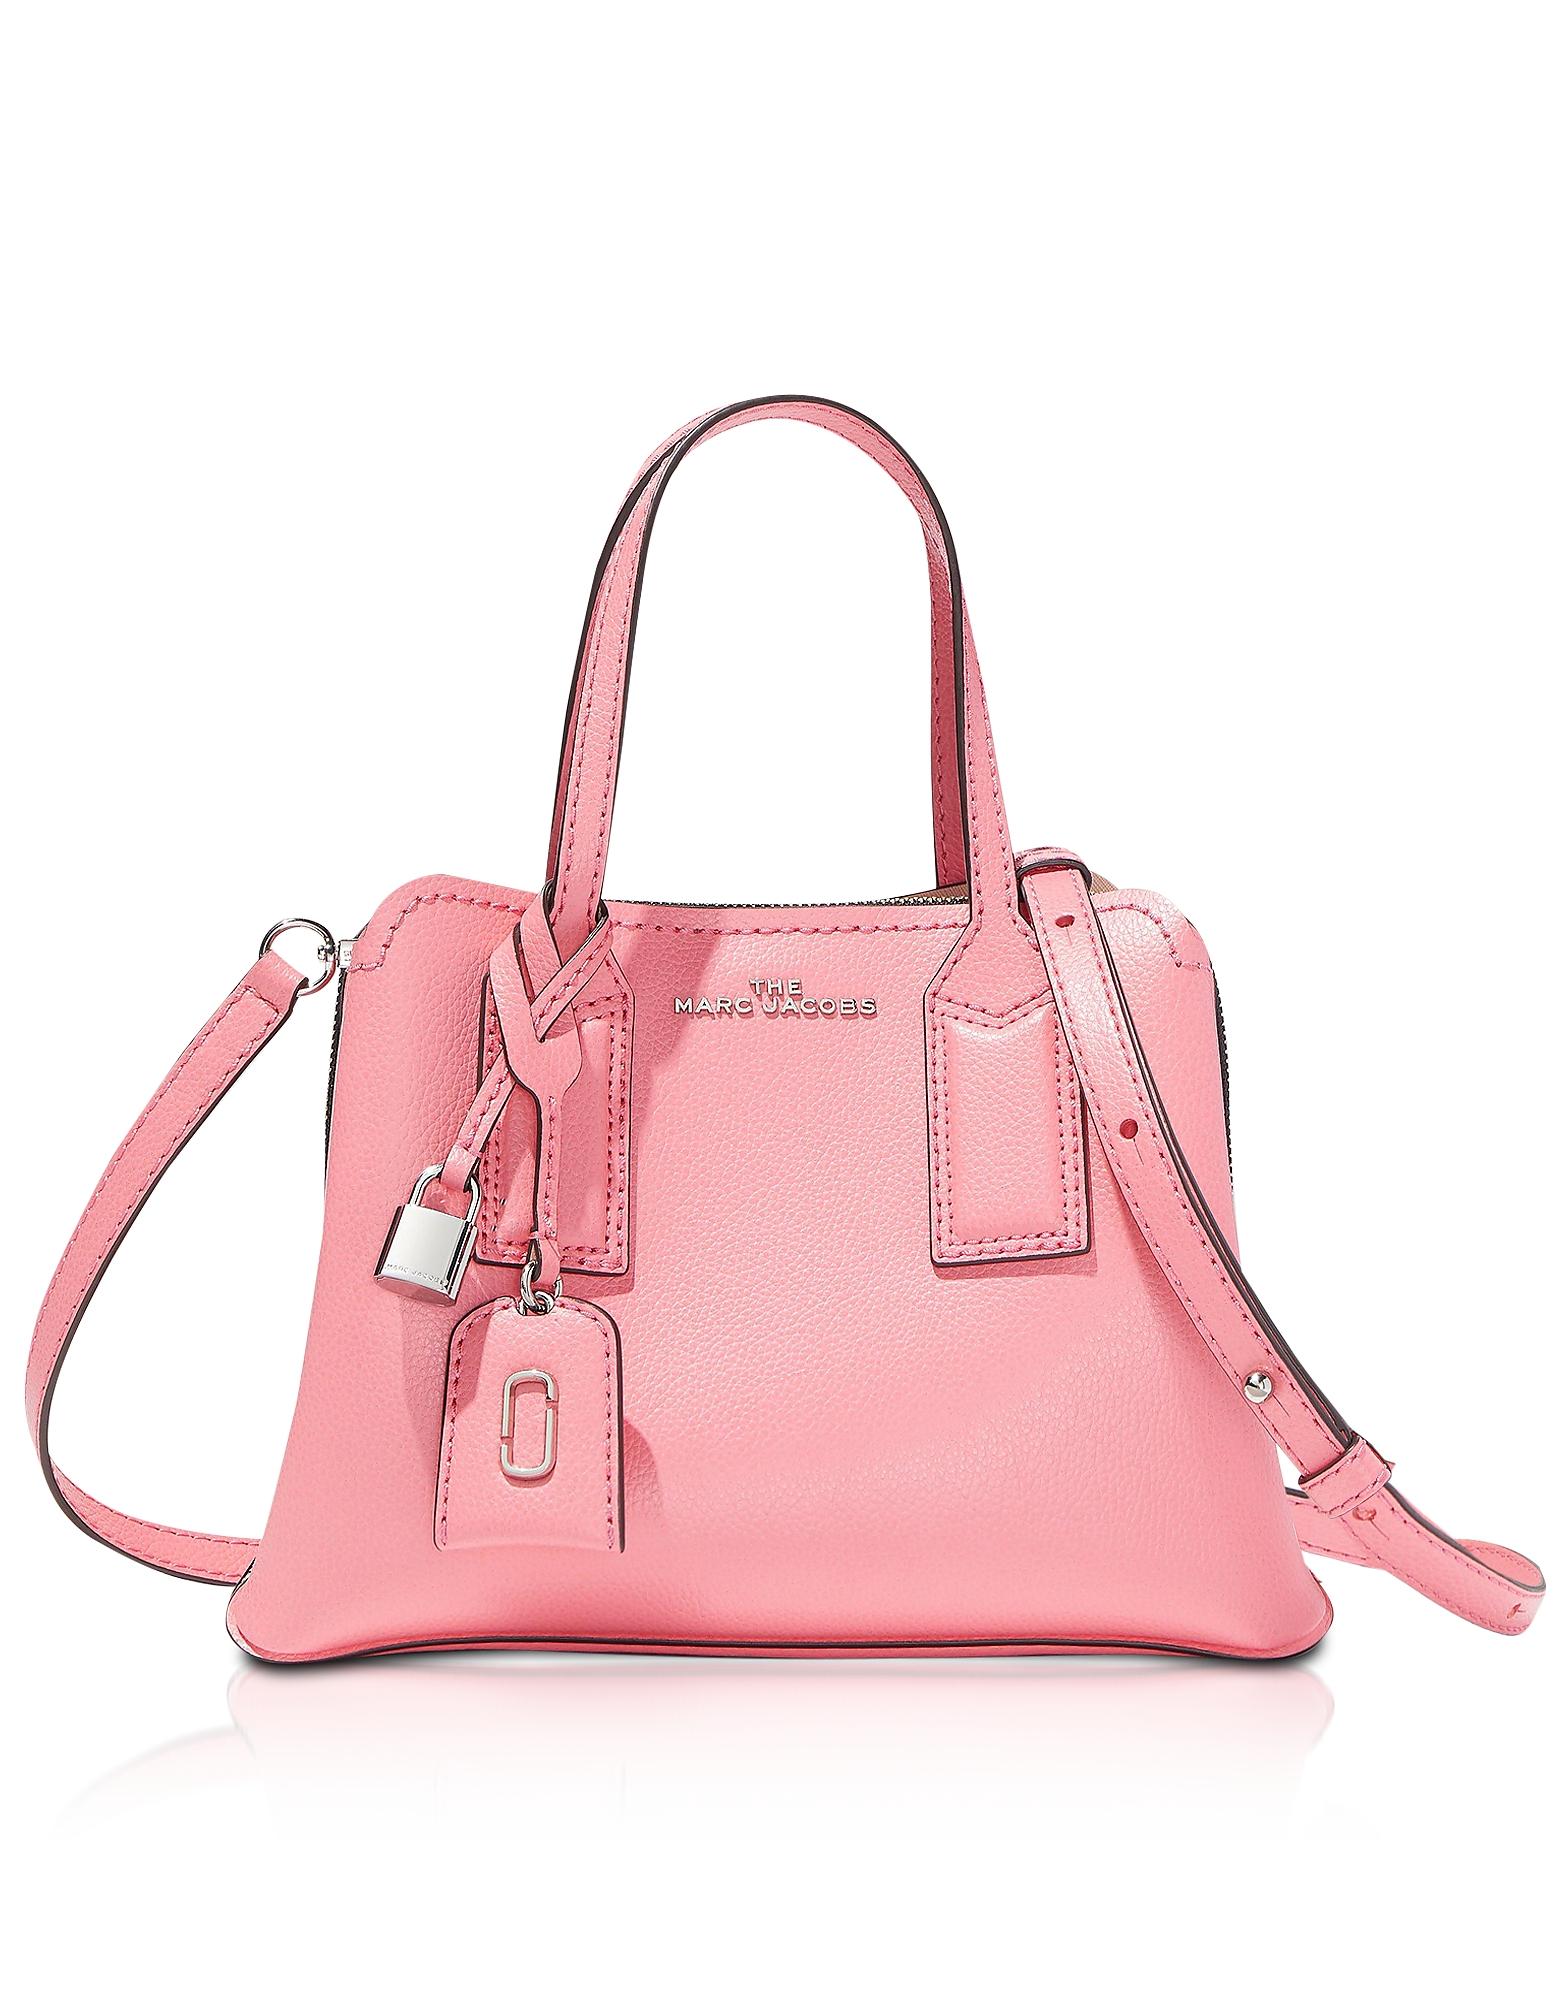 Marc Jacobs Designer Handbags, The Editor Leather Crossbody Bag